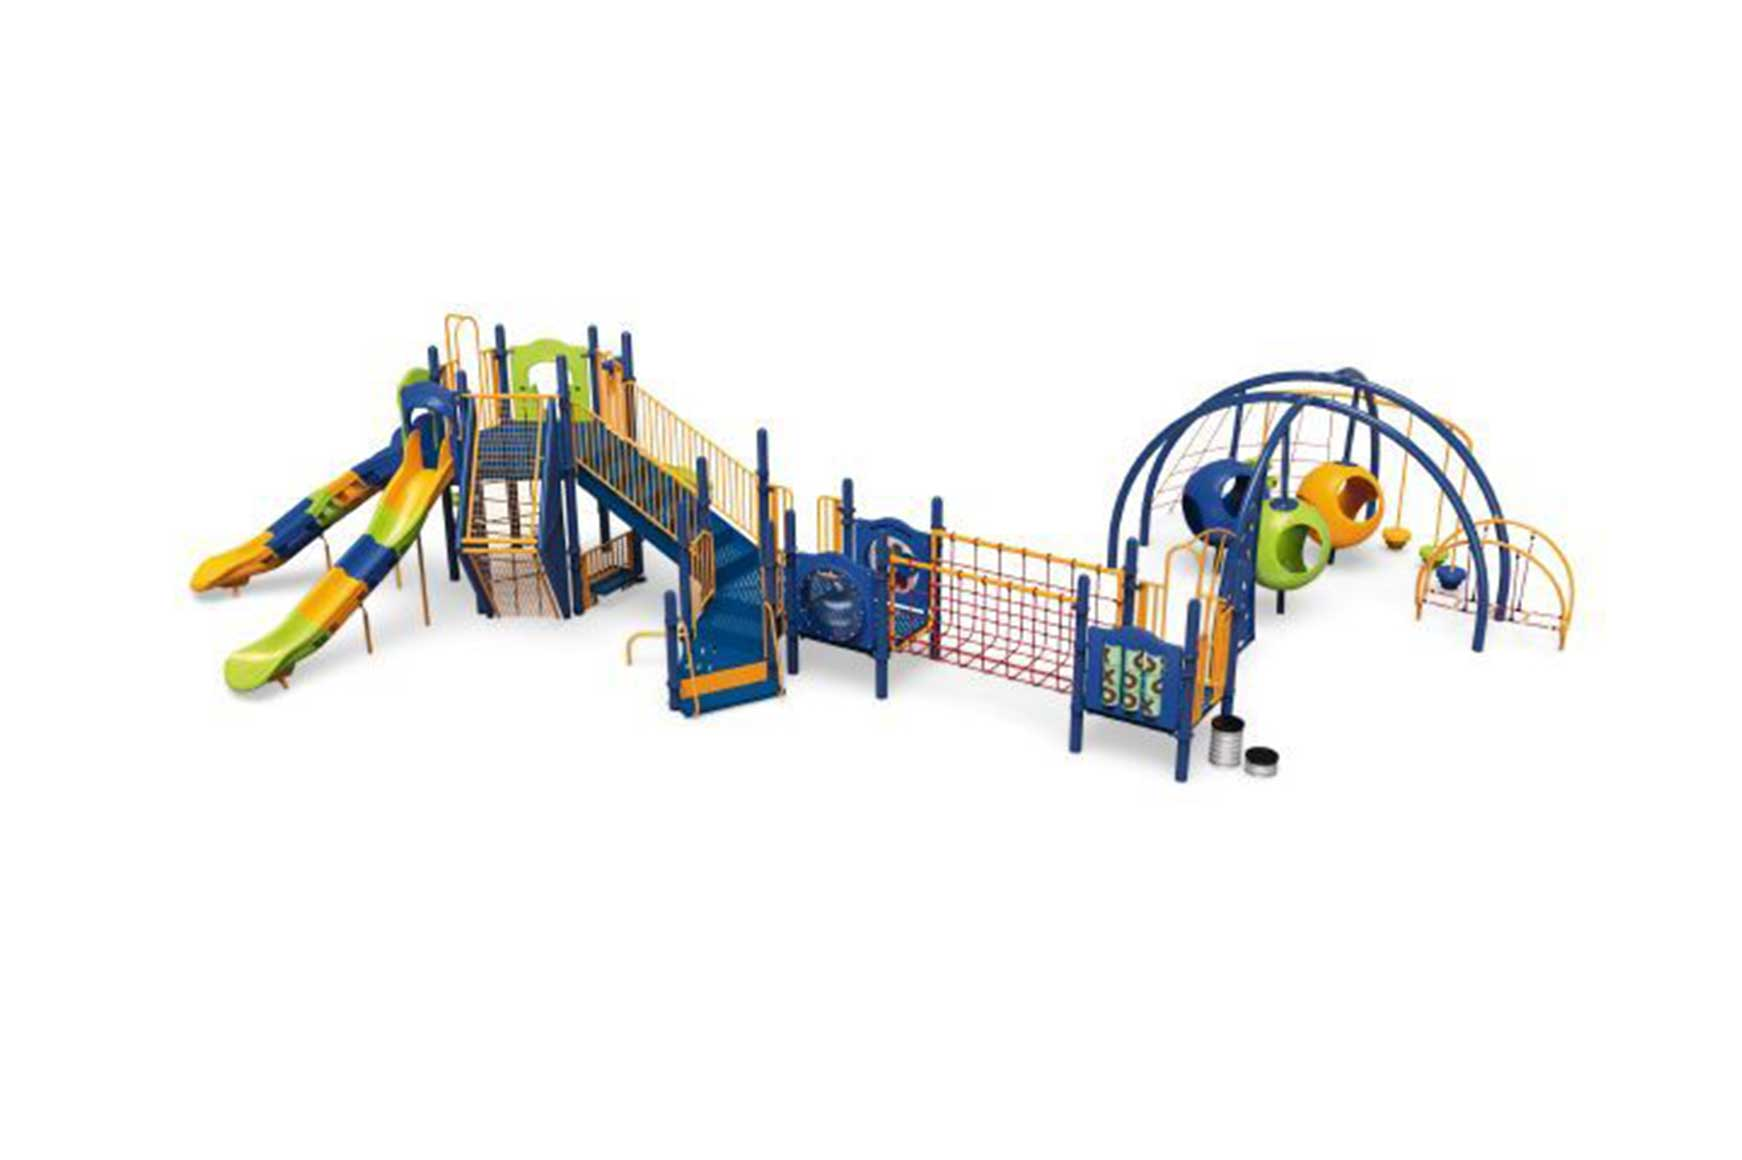 NRG Builder Structure 915